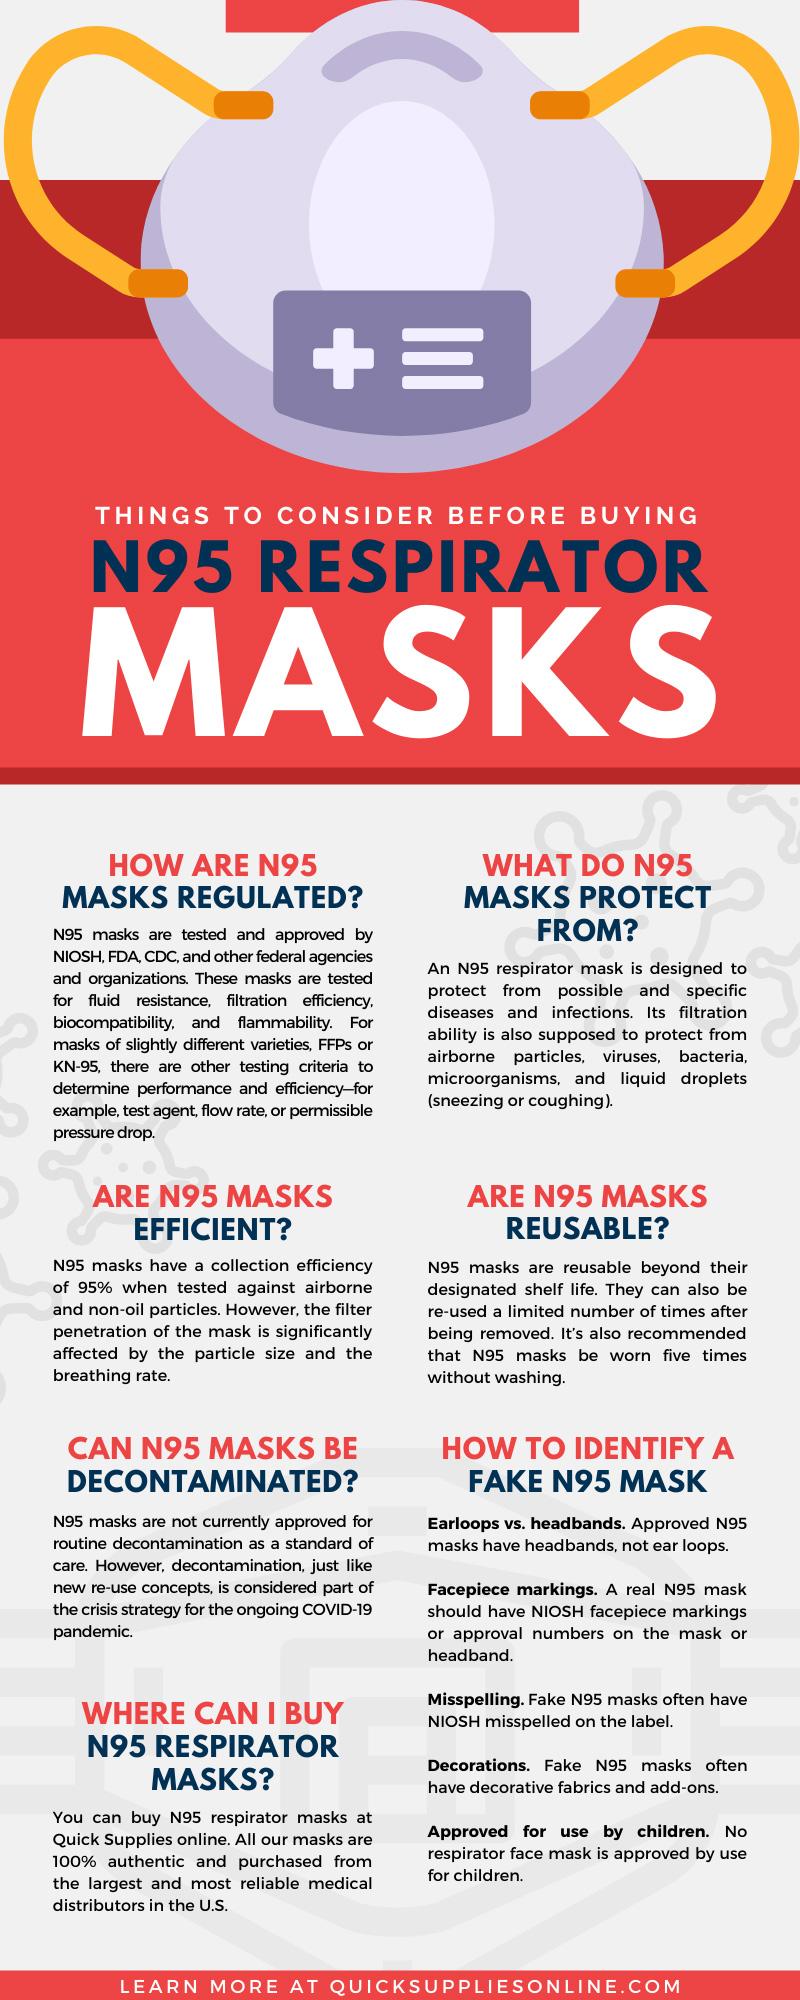 Things To Consider Before Buying N95 Respirator Masks